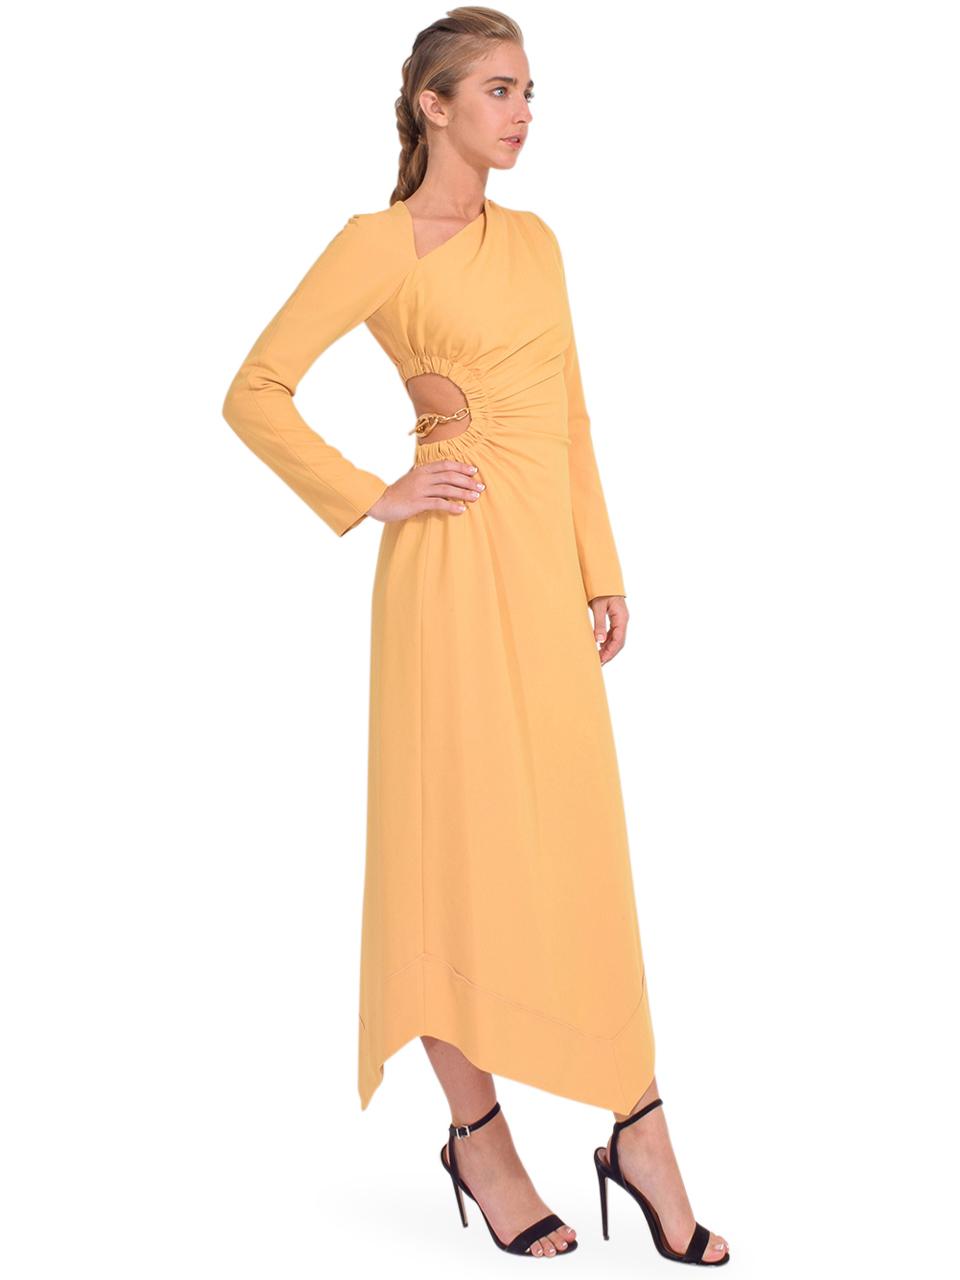 Jonathan Simkhai Christie Draped Cutout Dress in Honey Side View